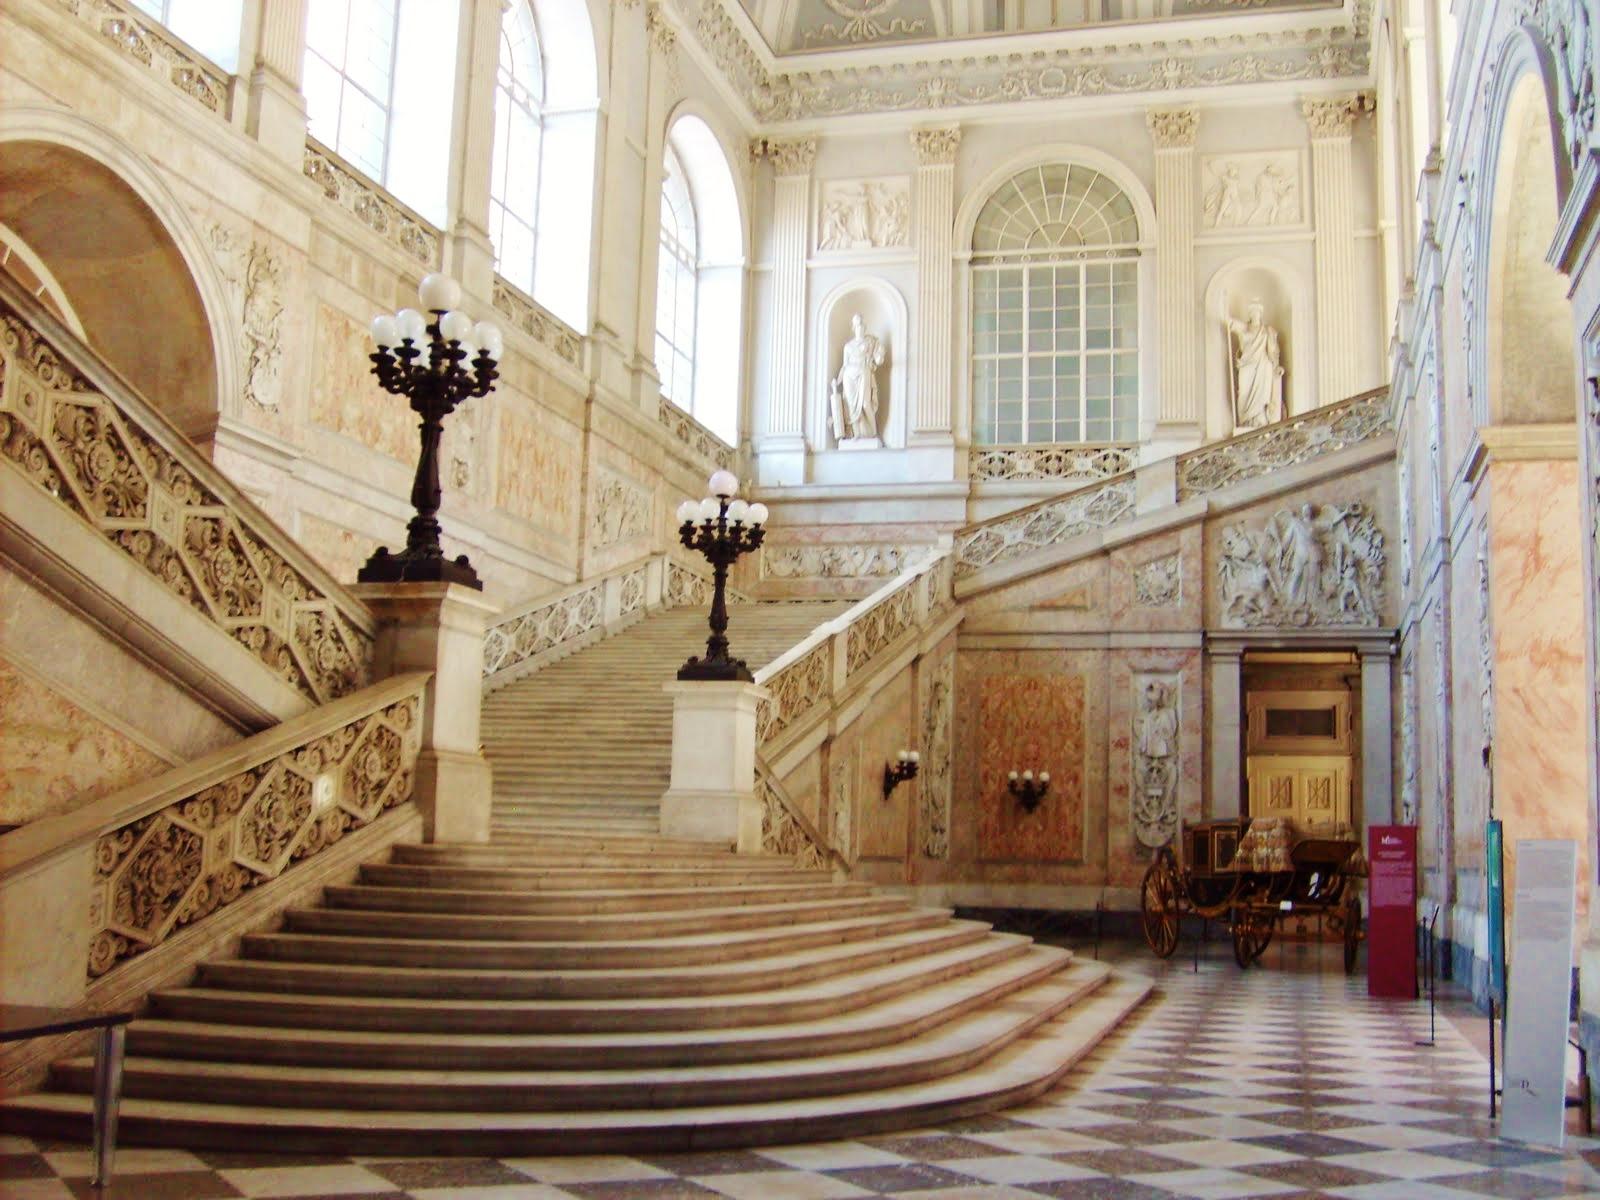 palazzo_reale_-_ingresso_e_scalone2.jpg